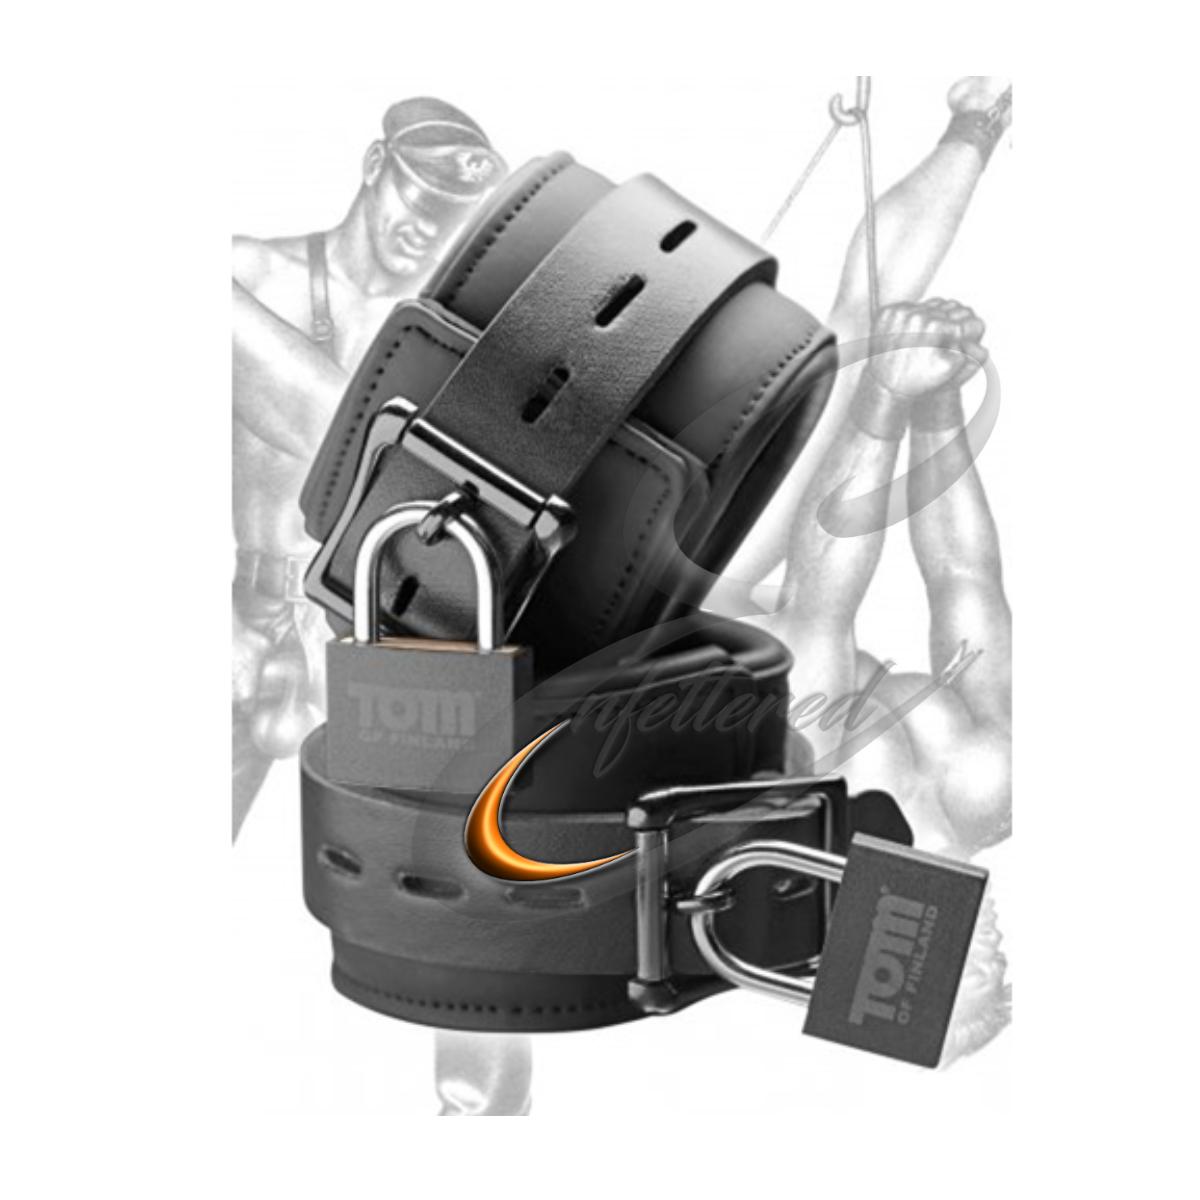 Enfettered Neoprene Wrist Cuffs by Tom of Finland